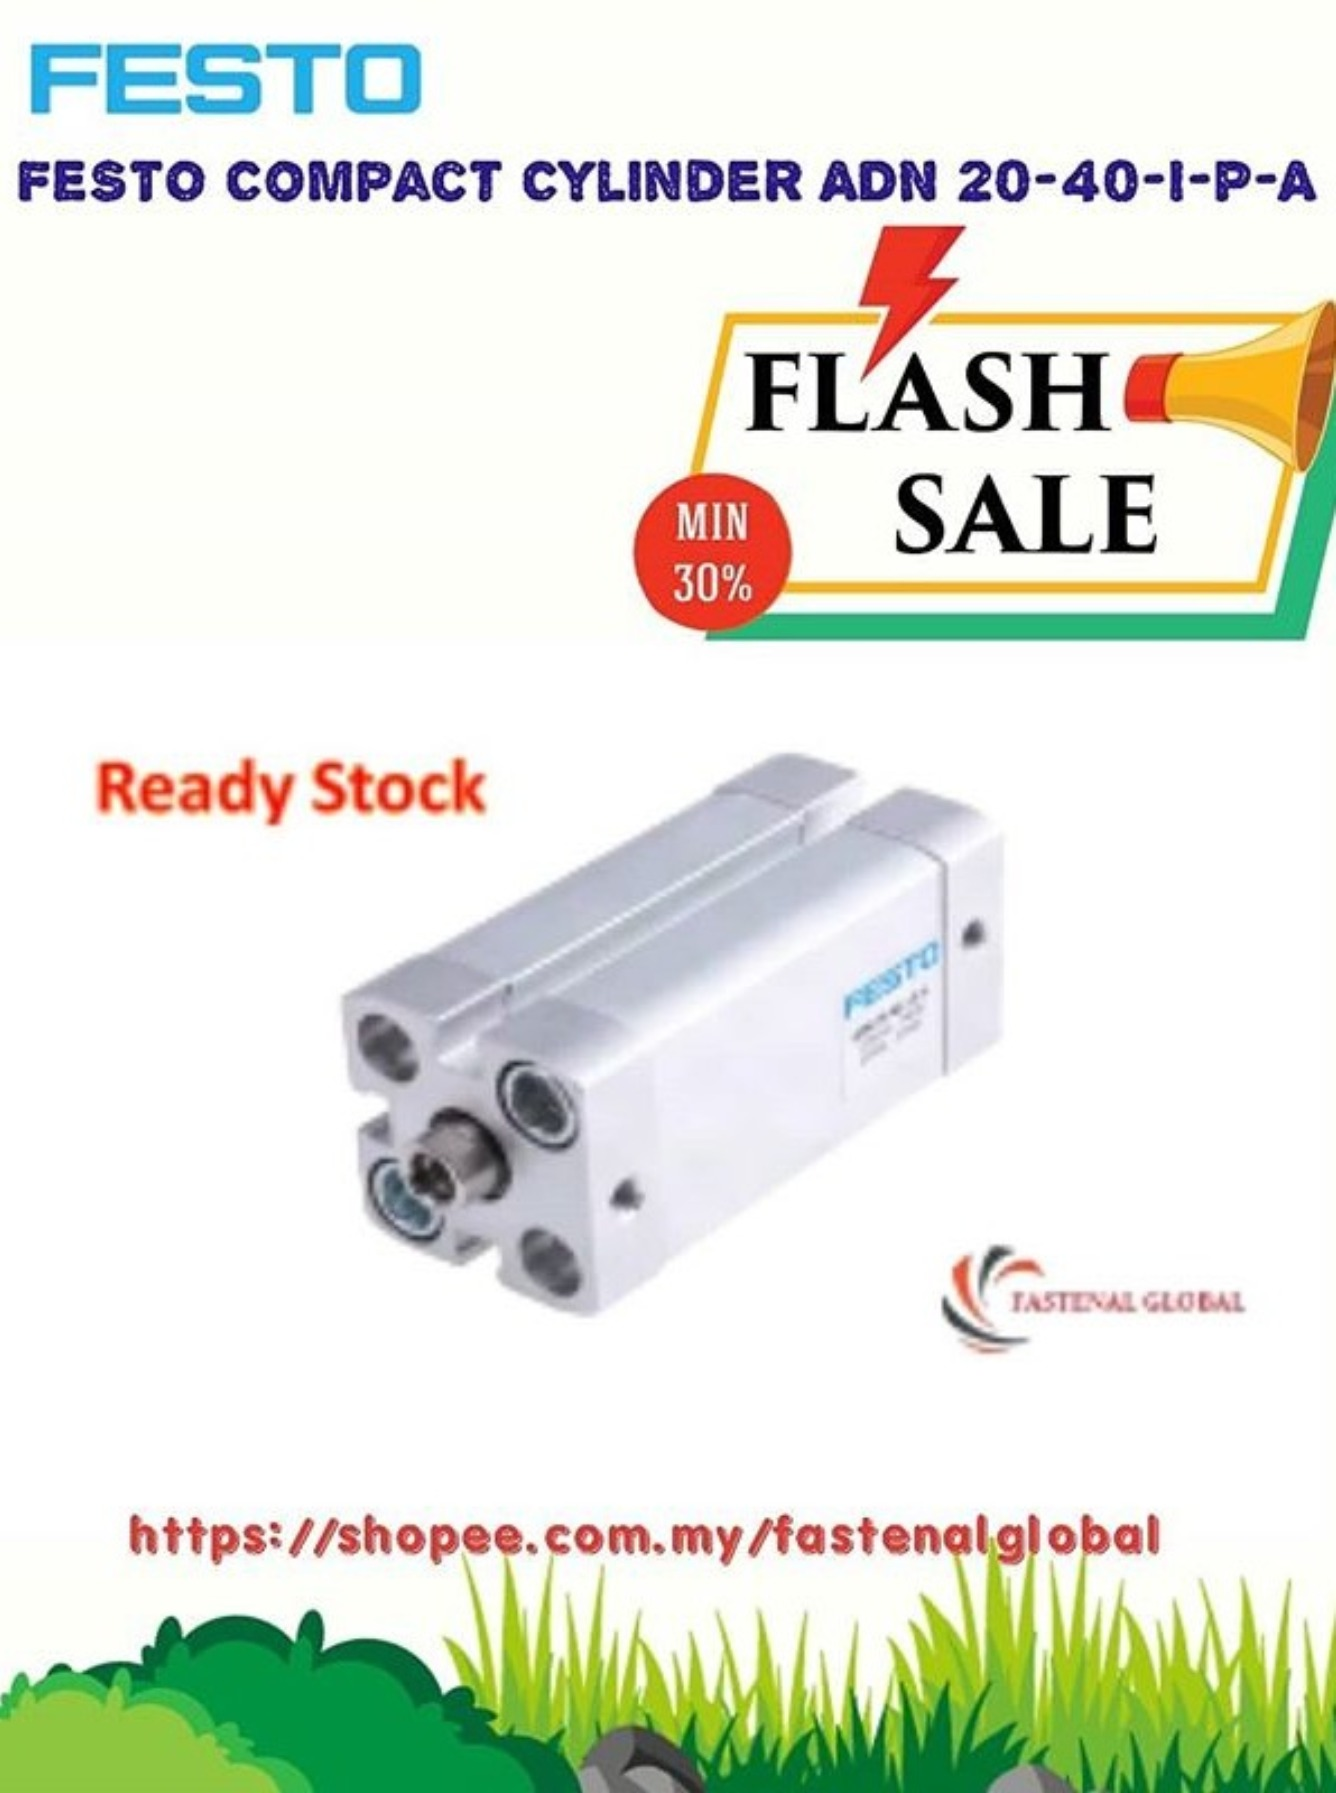 Festo%2520Compact%2520Cylinder%2520ADN%2